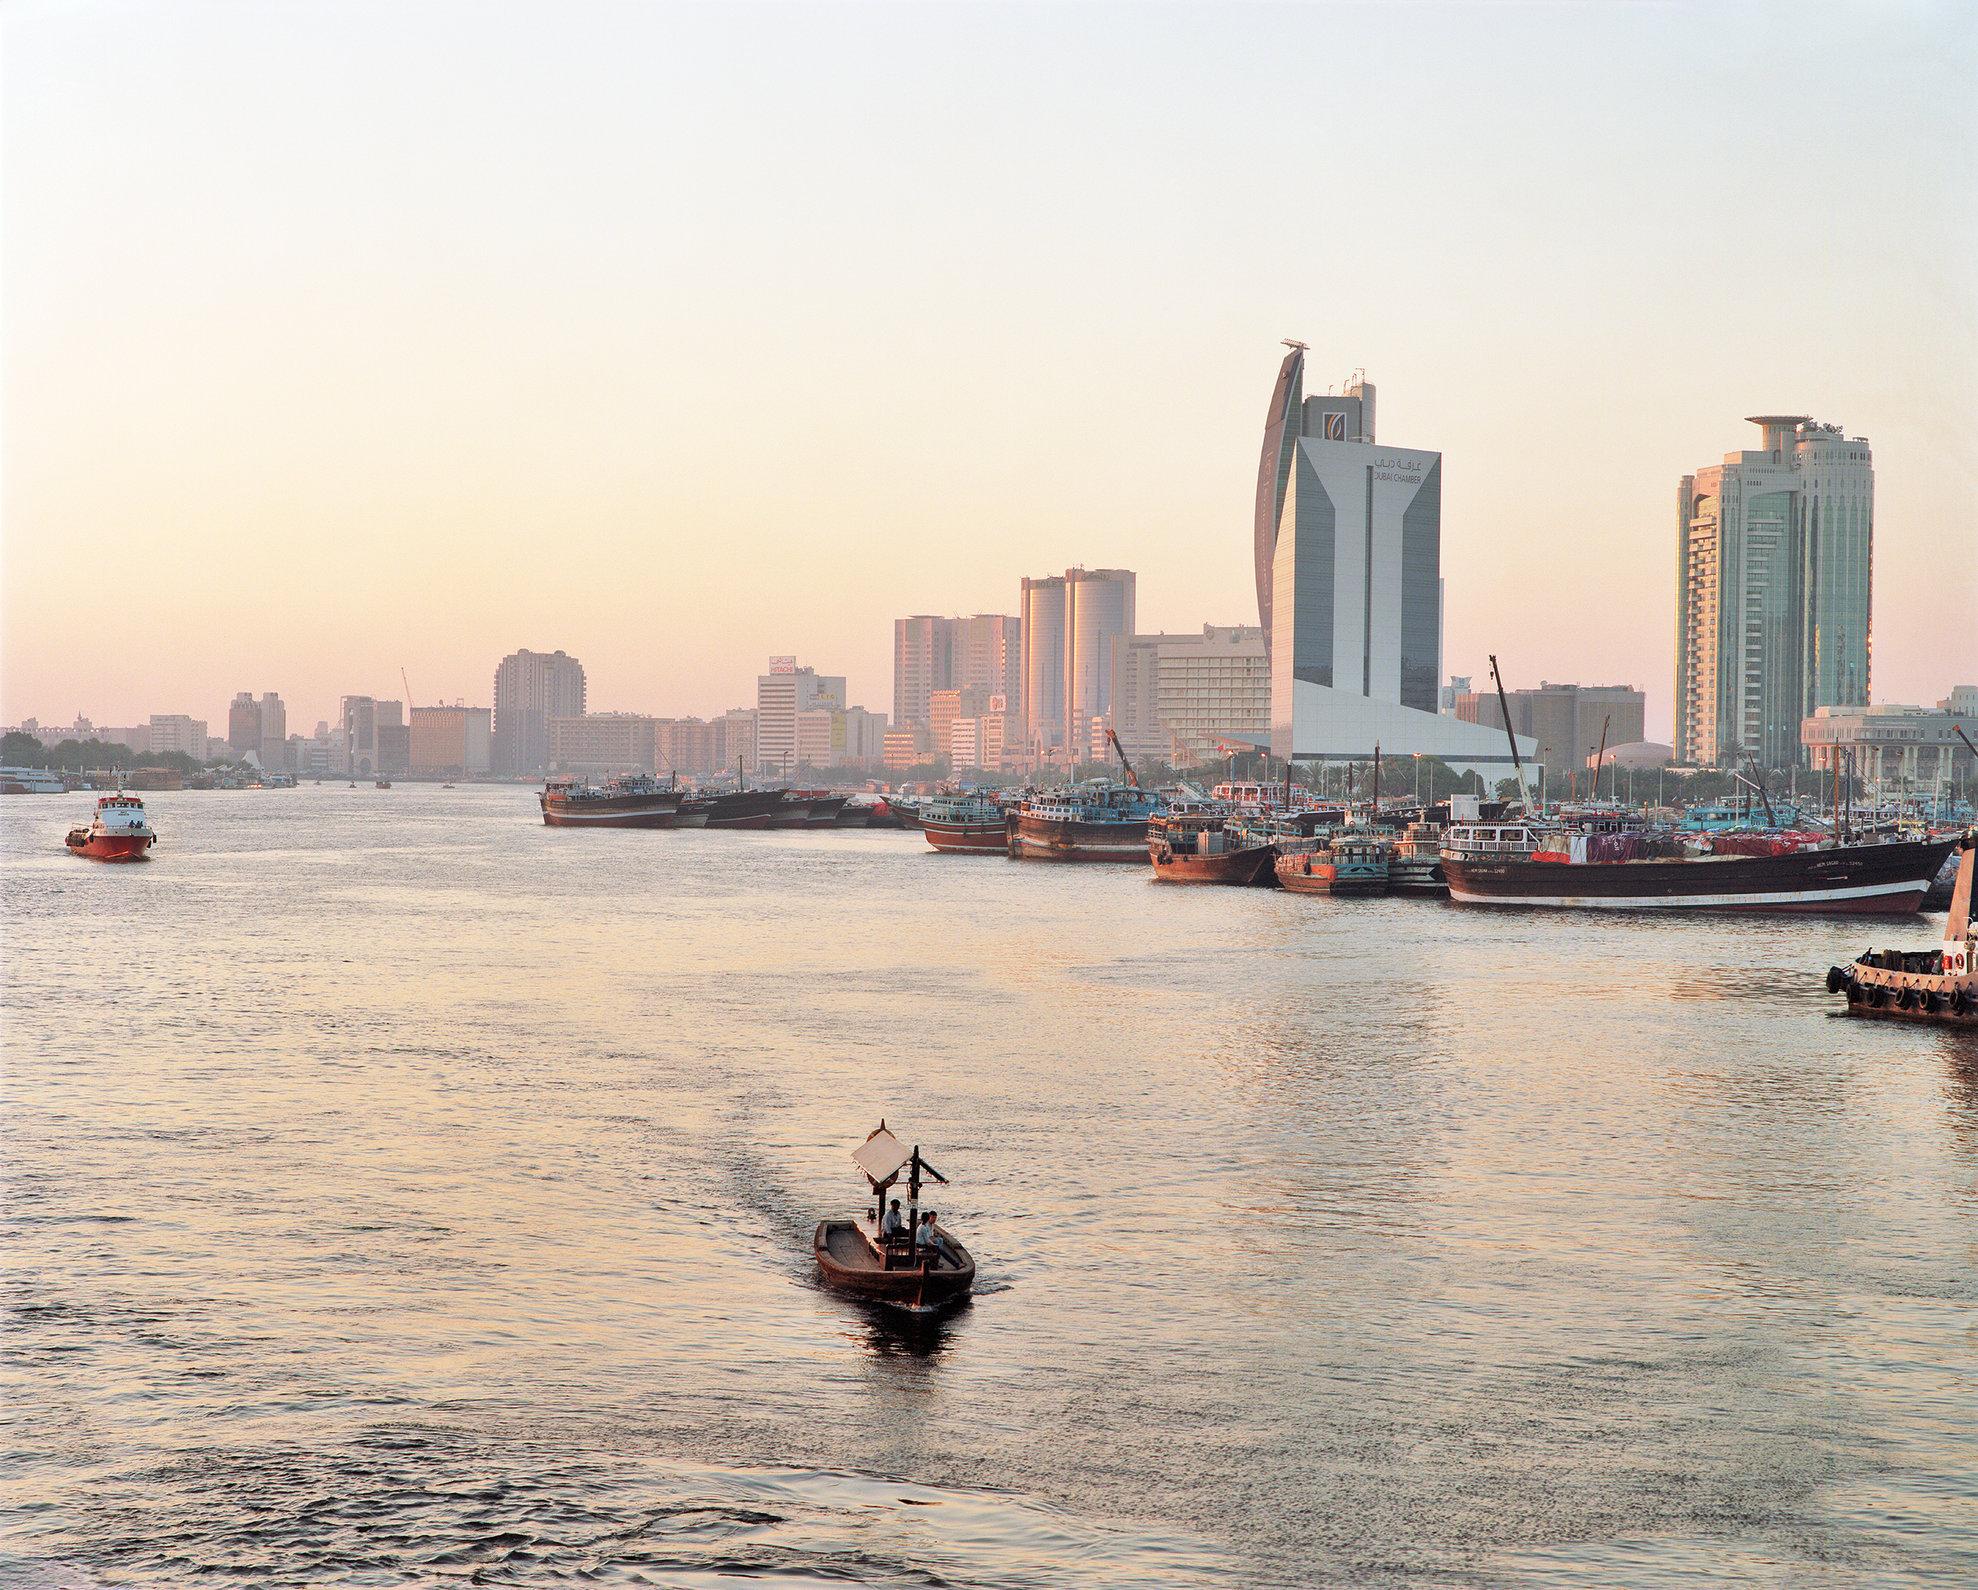 Dubai Creek and dhow wharfs